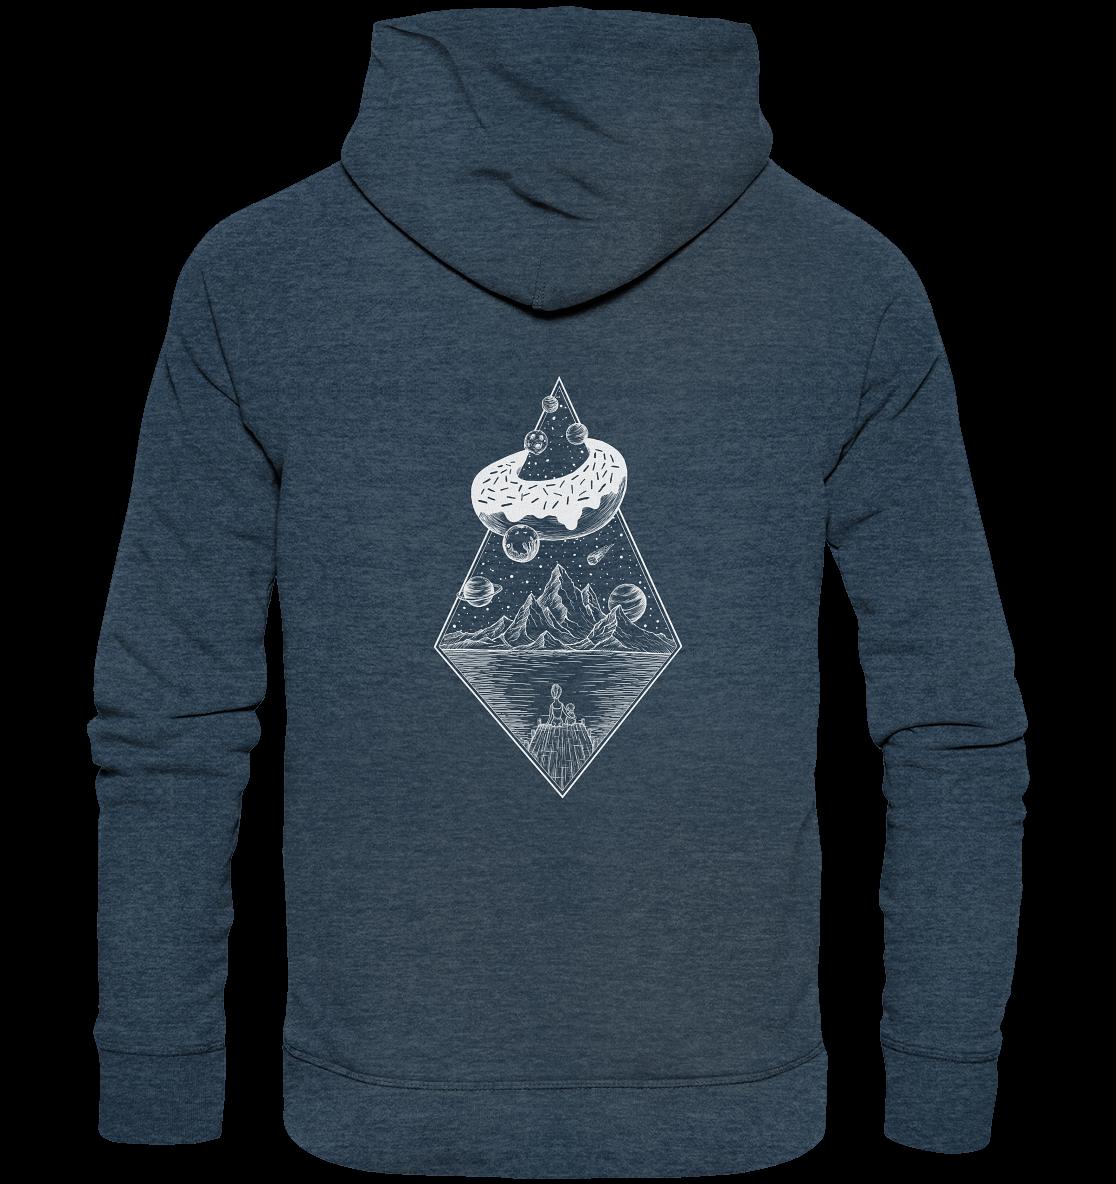 back-organic-fashion-hoodie-102940-1116x.png